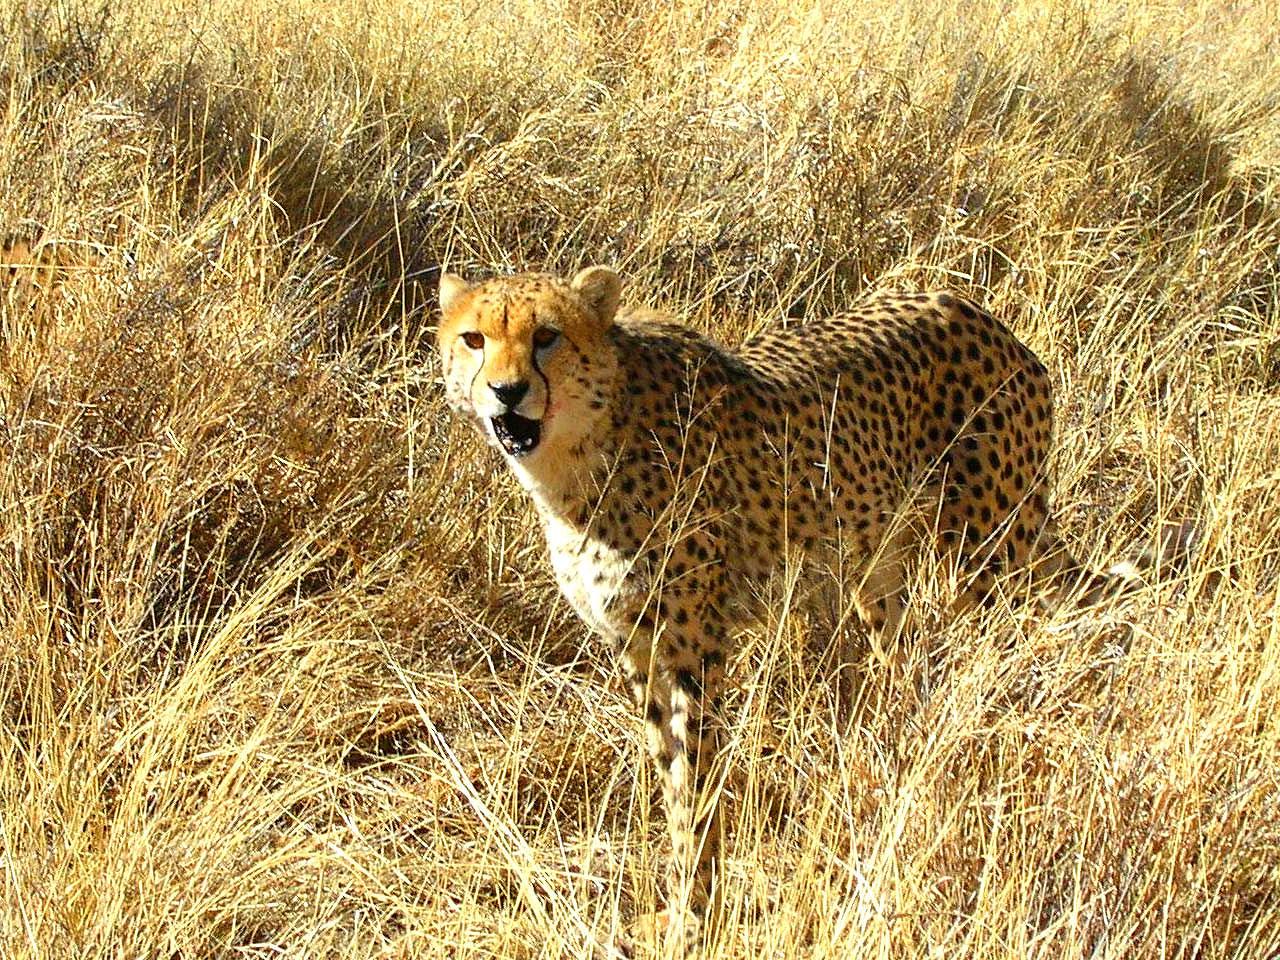 Central Namibia inline image 5e425ea8419d2